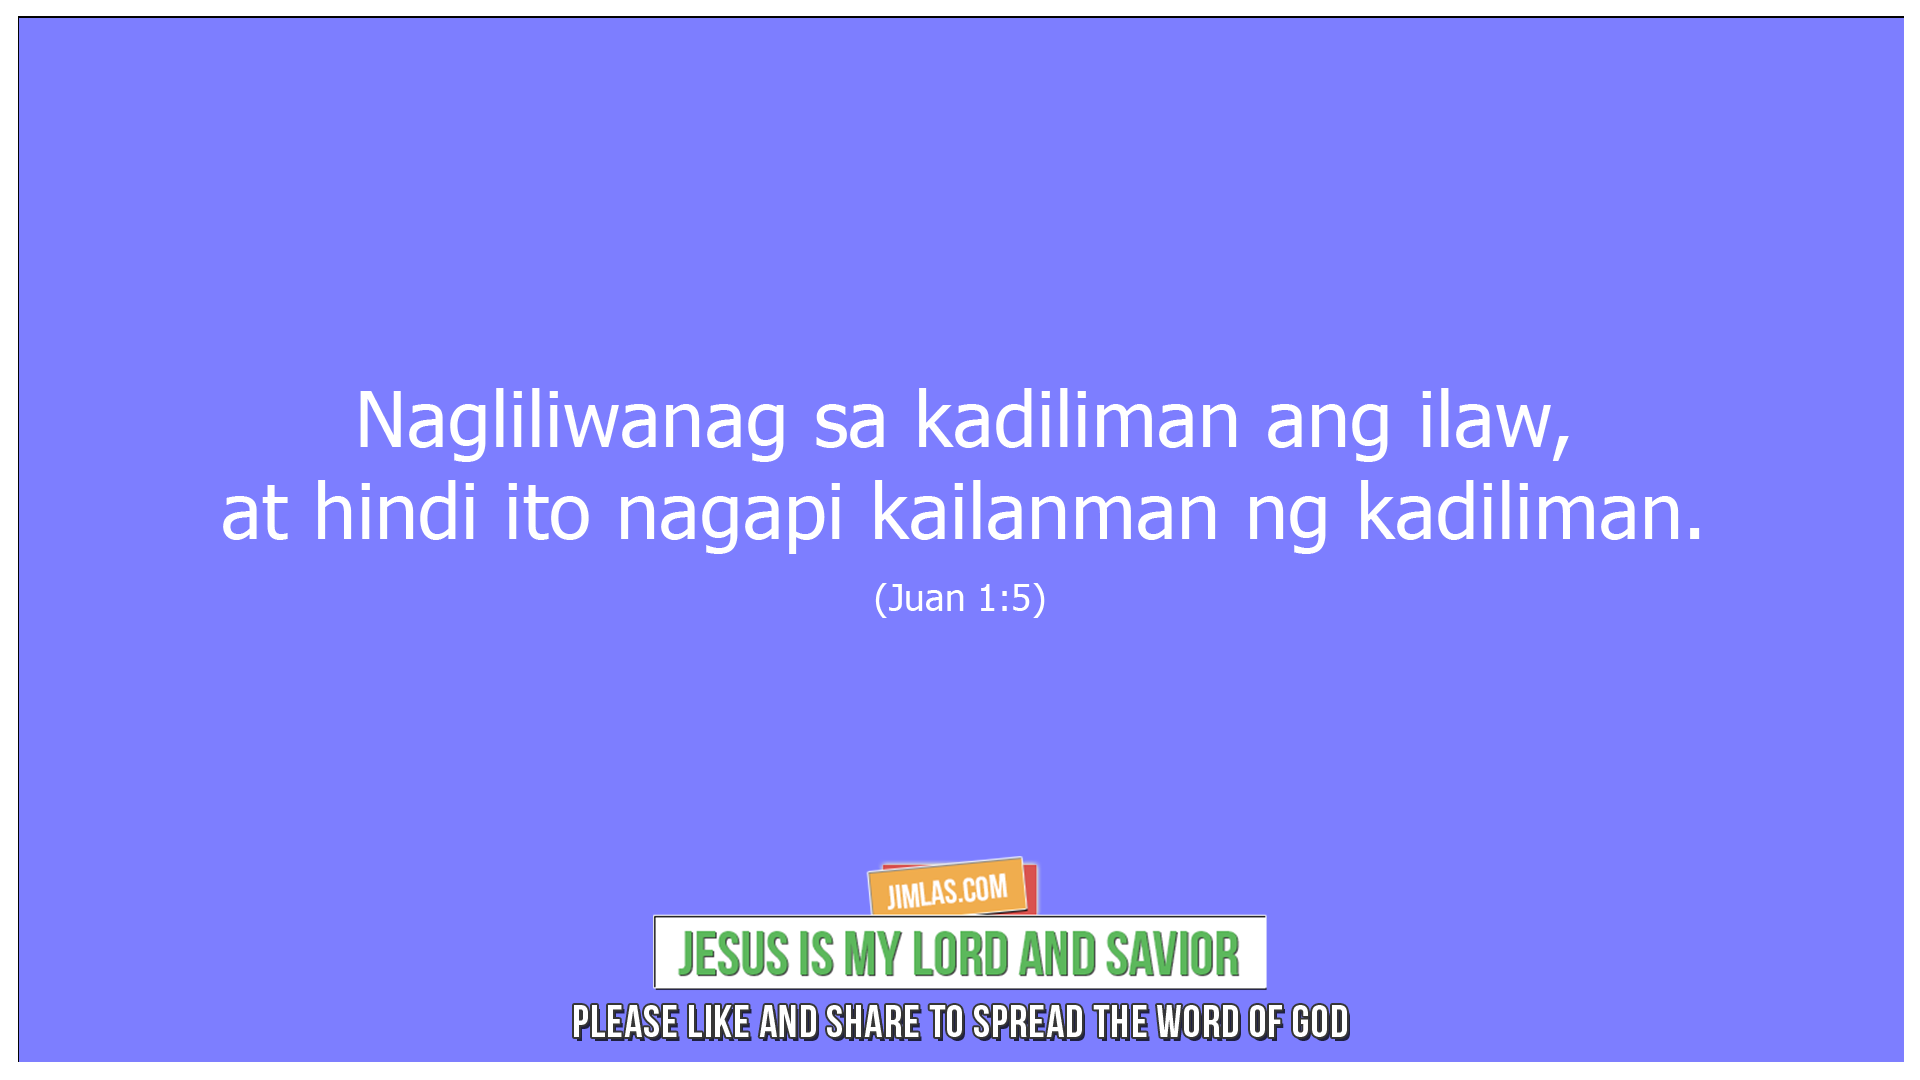 Juan 1 5, Juan 1:5